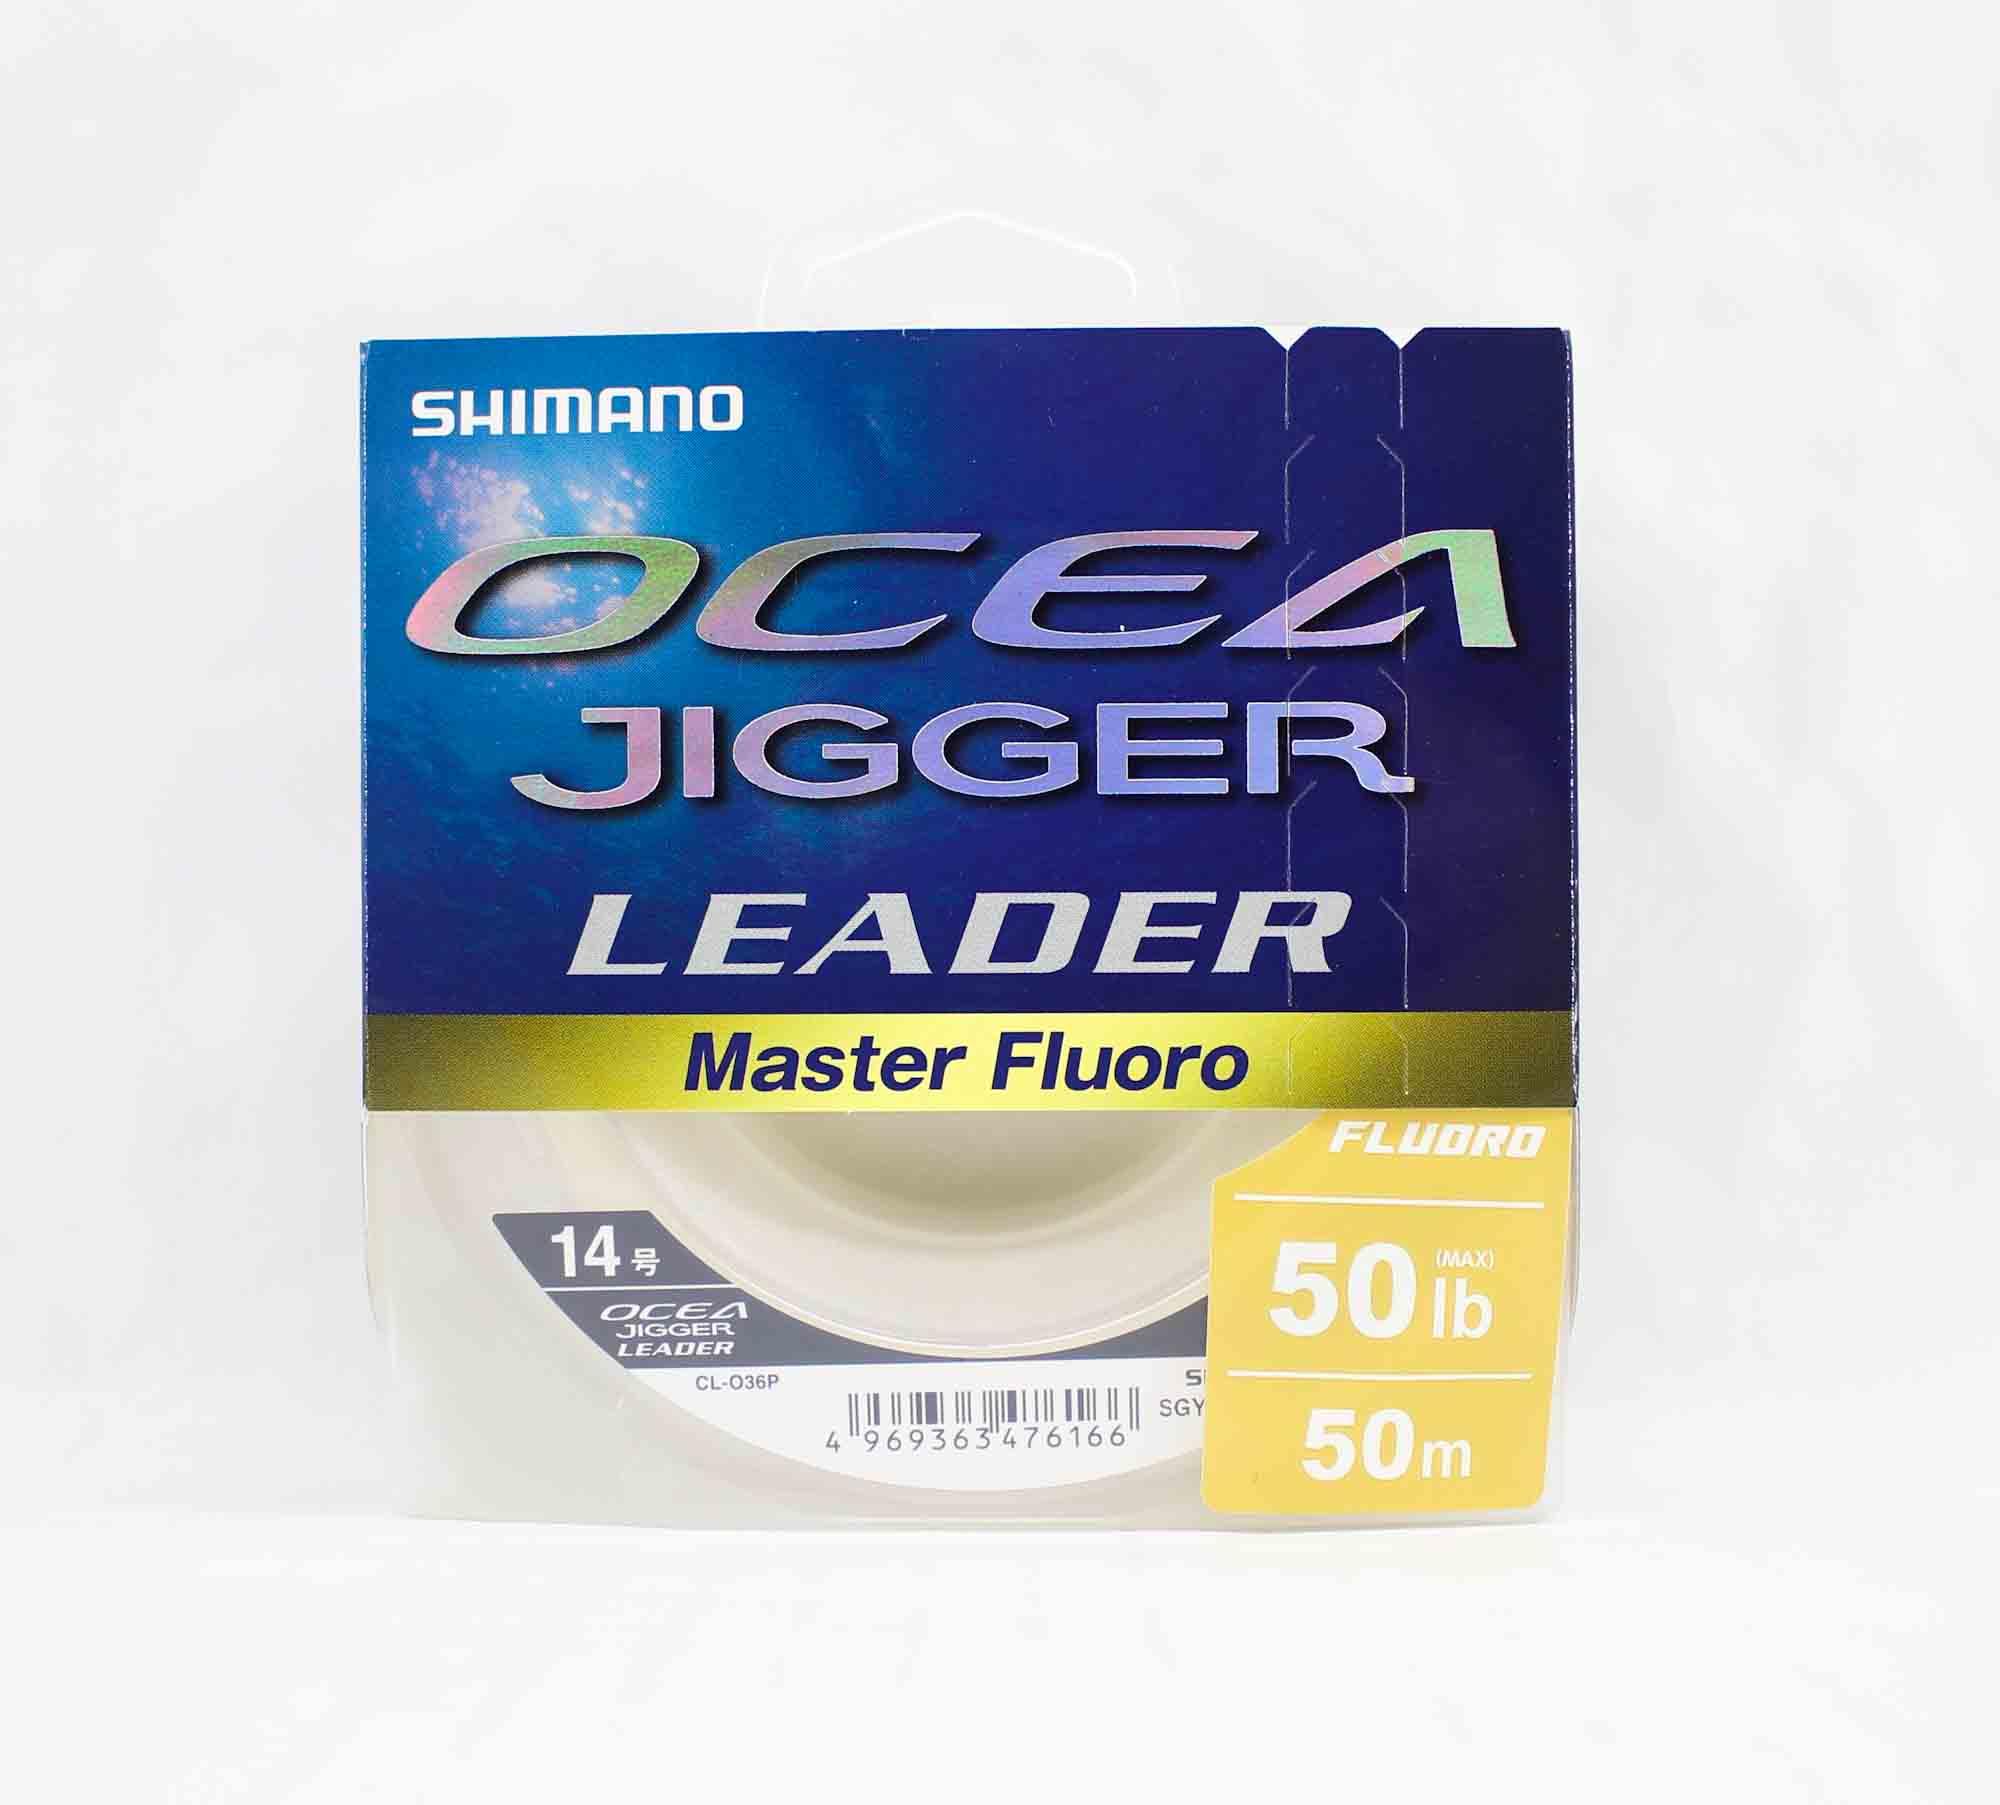 Shimano CL-036P Ocea Jigger Master Fluorocarbon Leader 50m 50lb 476166